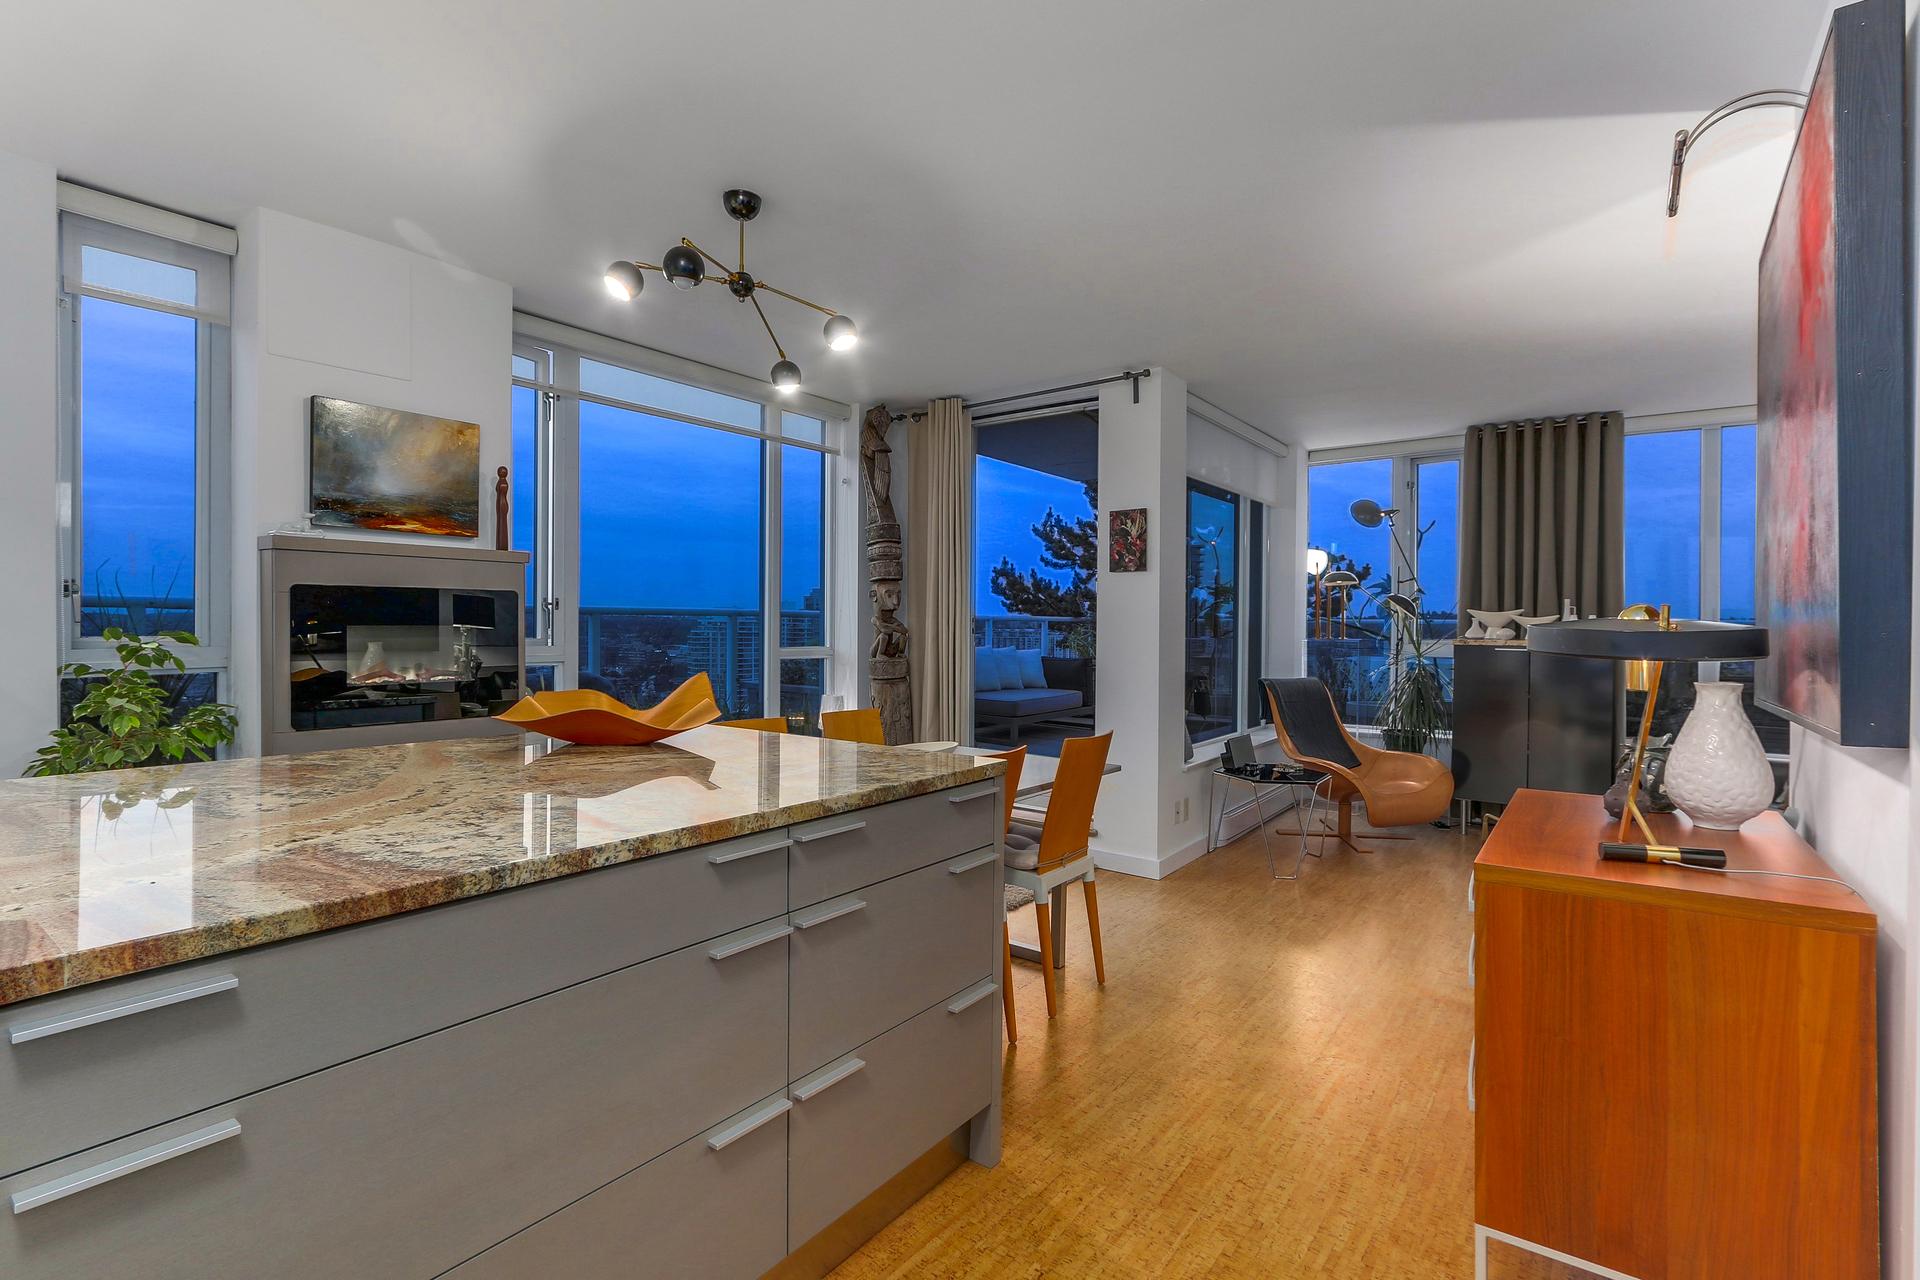 The KItchen 2405 - 550 Taylor Street, Downtown VW, Vancouver West at 2405 - 550 Taylor Street, Downtown VW, Vancouver West